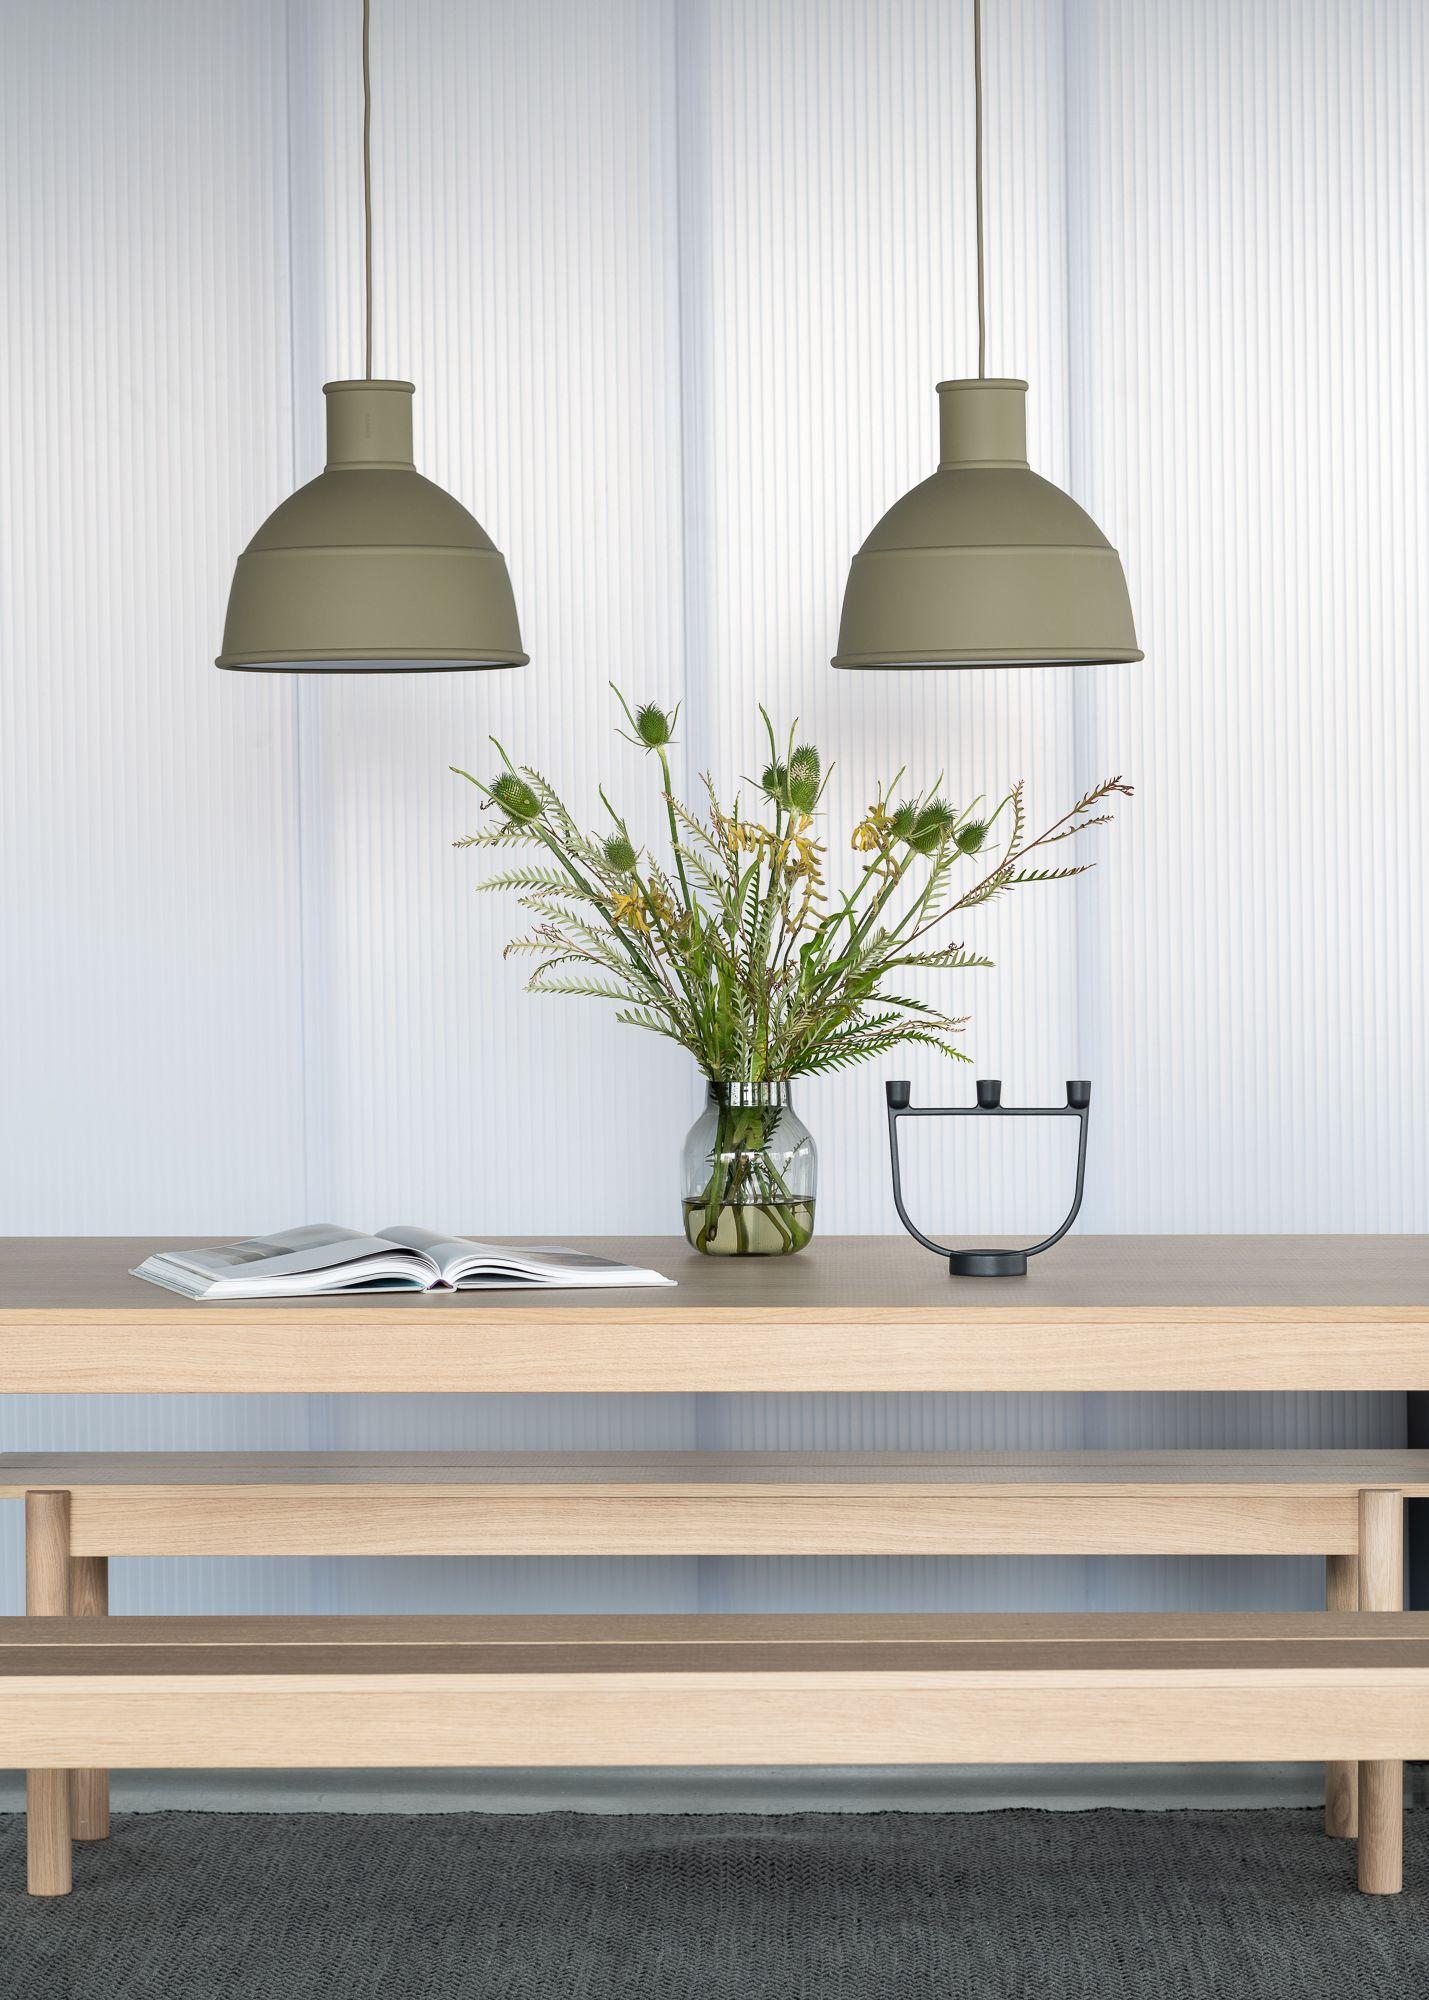 Playful And Modern Scandinavian Lighting Interior Inspiration For Dining Room Decor From Muuto A Quirky Scandinavian Lighting Scandi Dining Room Pendant Lamp